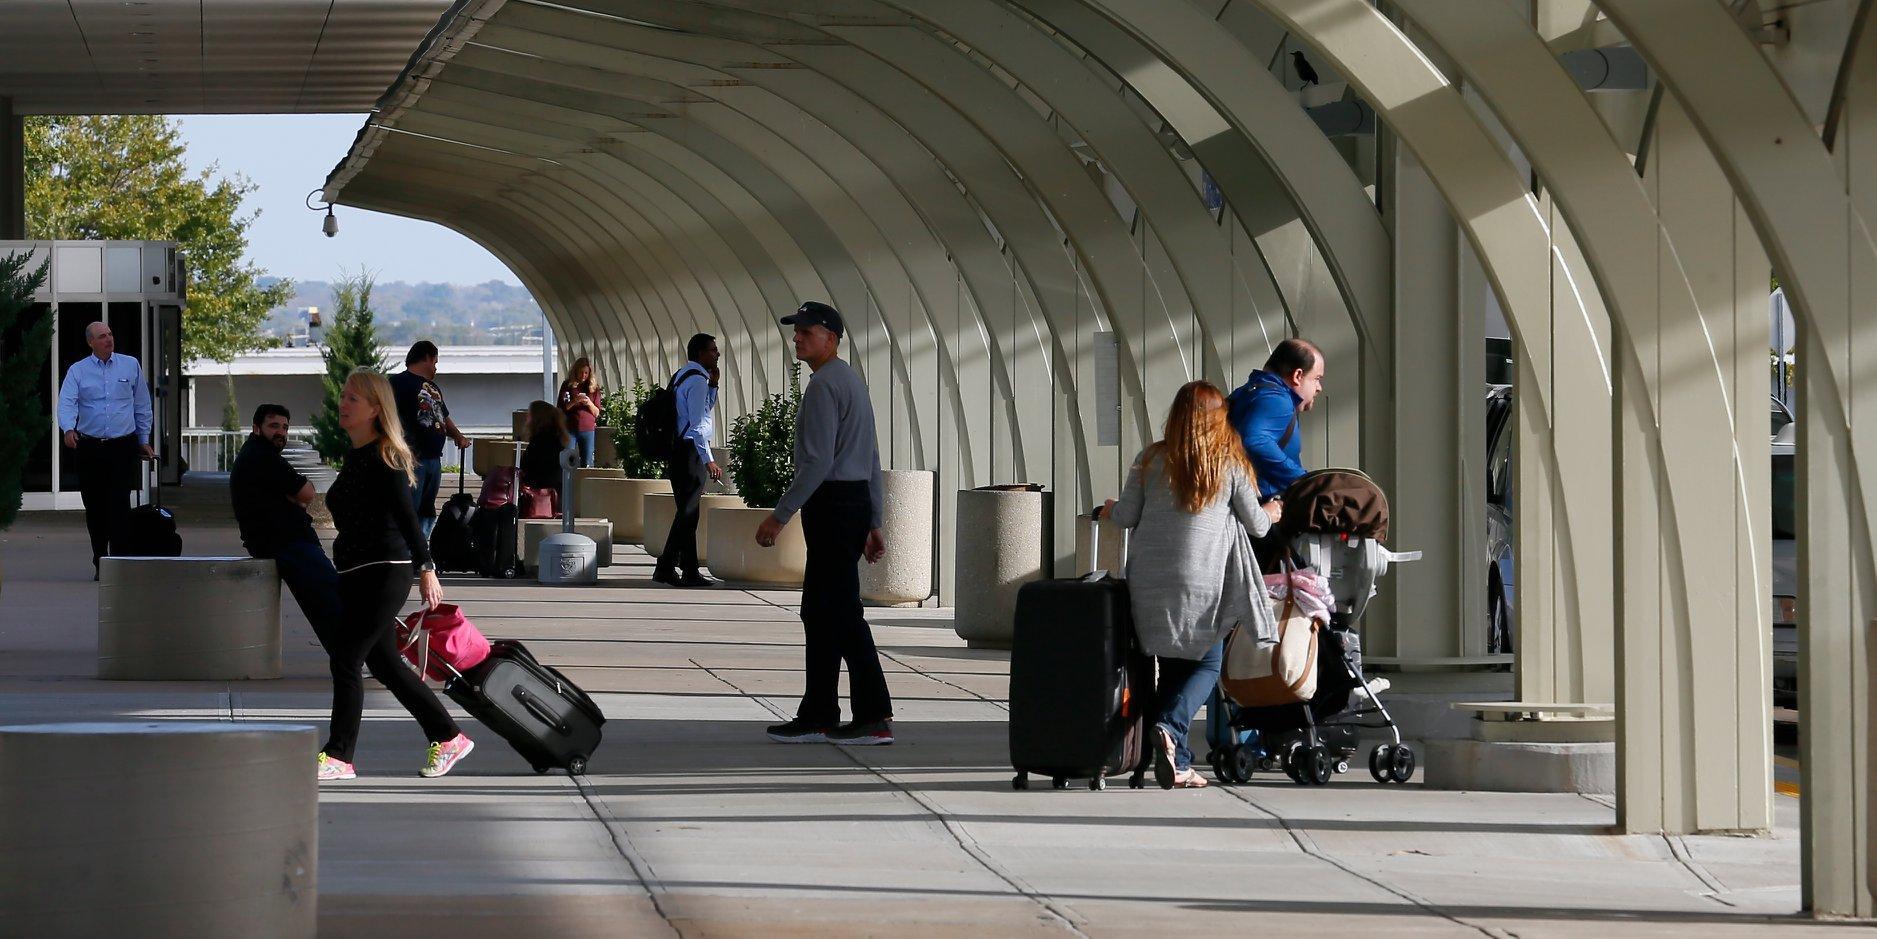 Tulsa Christmas Radio Stations 2020 Man Charged in Christmas Eve Tulsa Airport Threat   Public Radio Tulsa